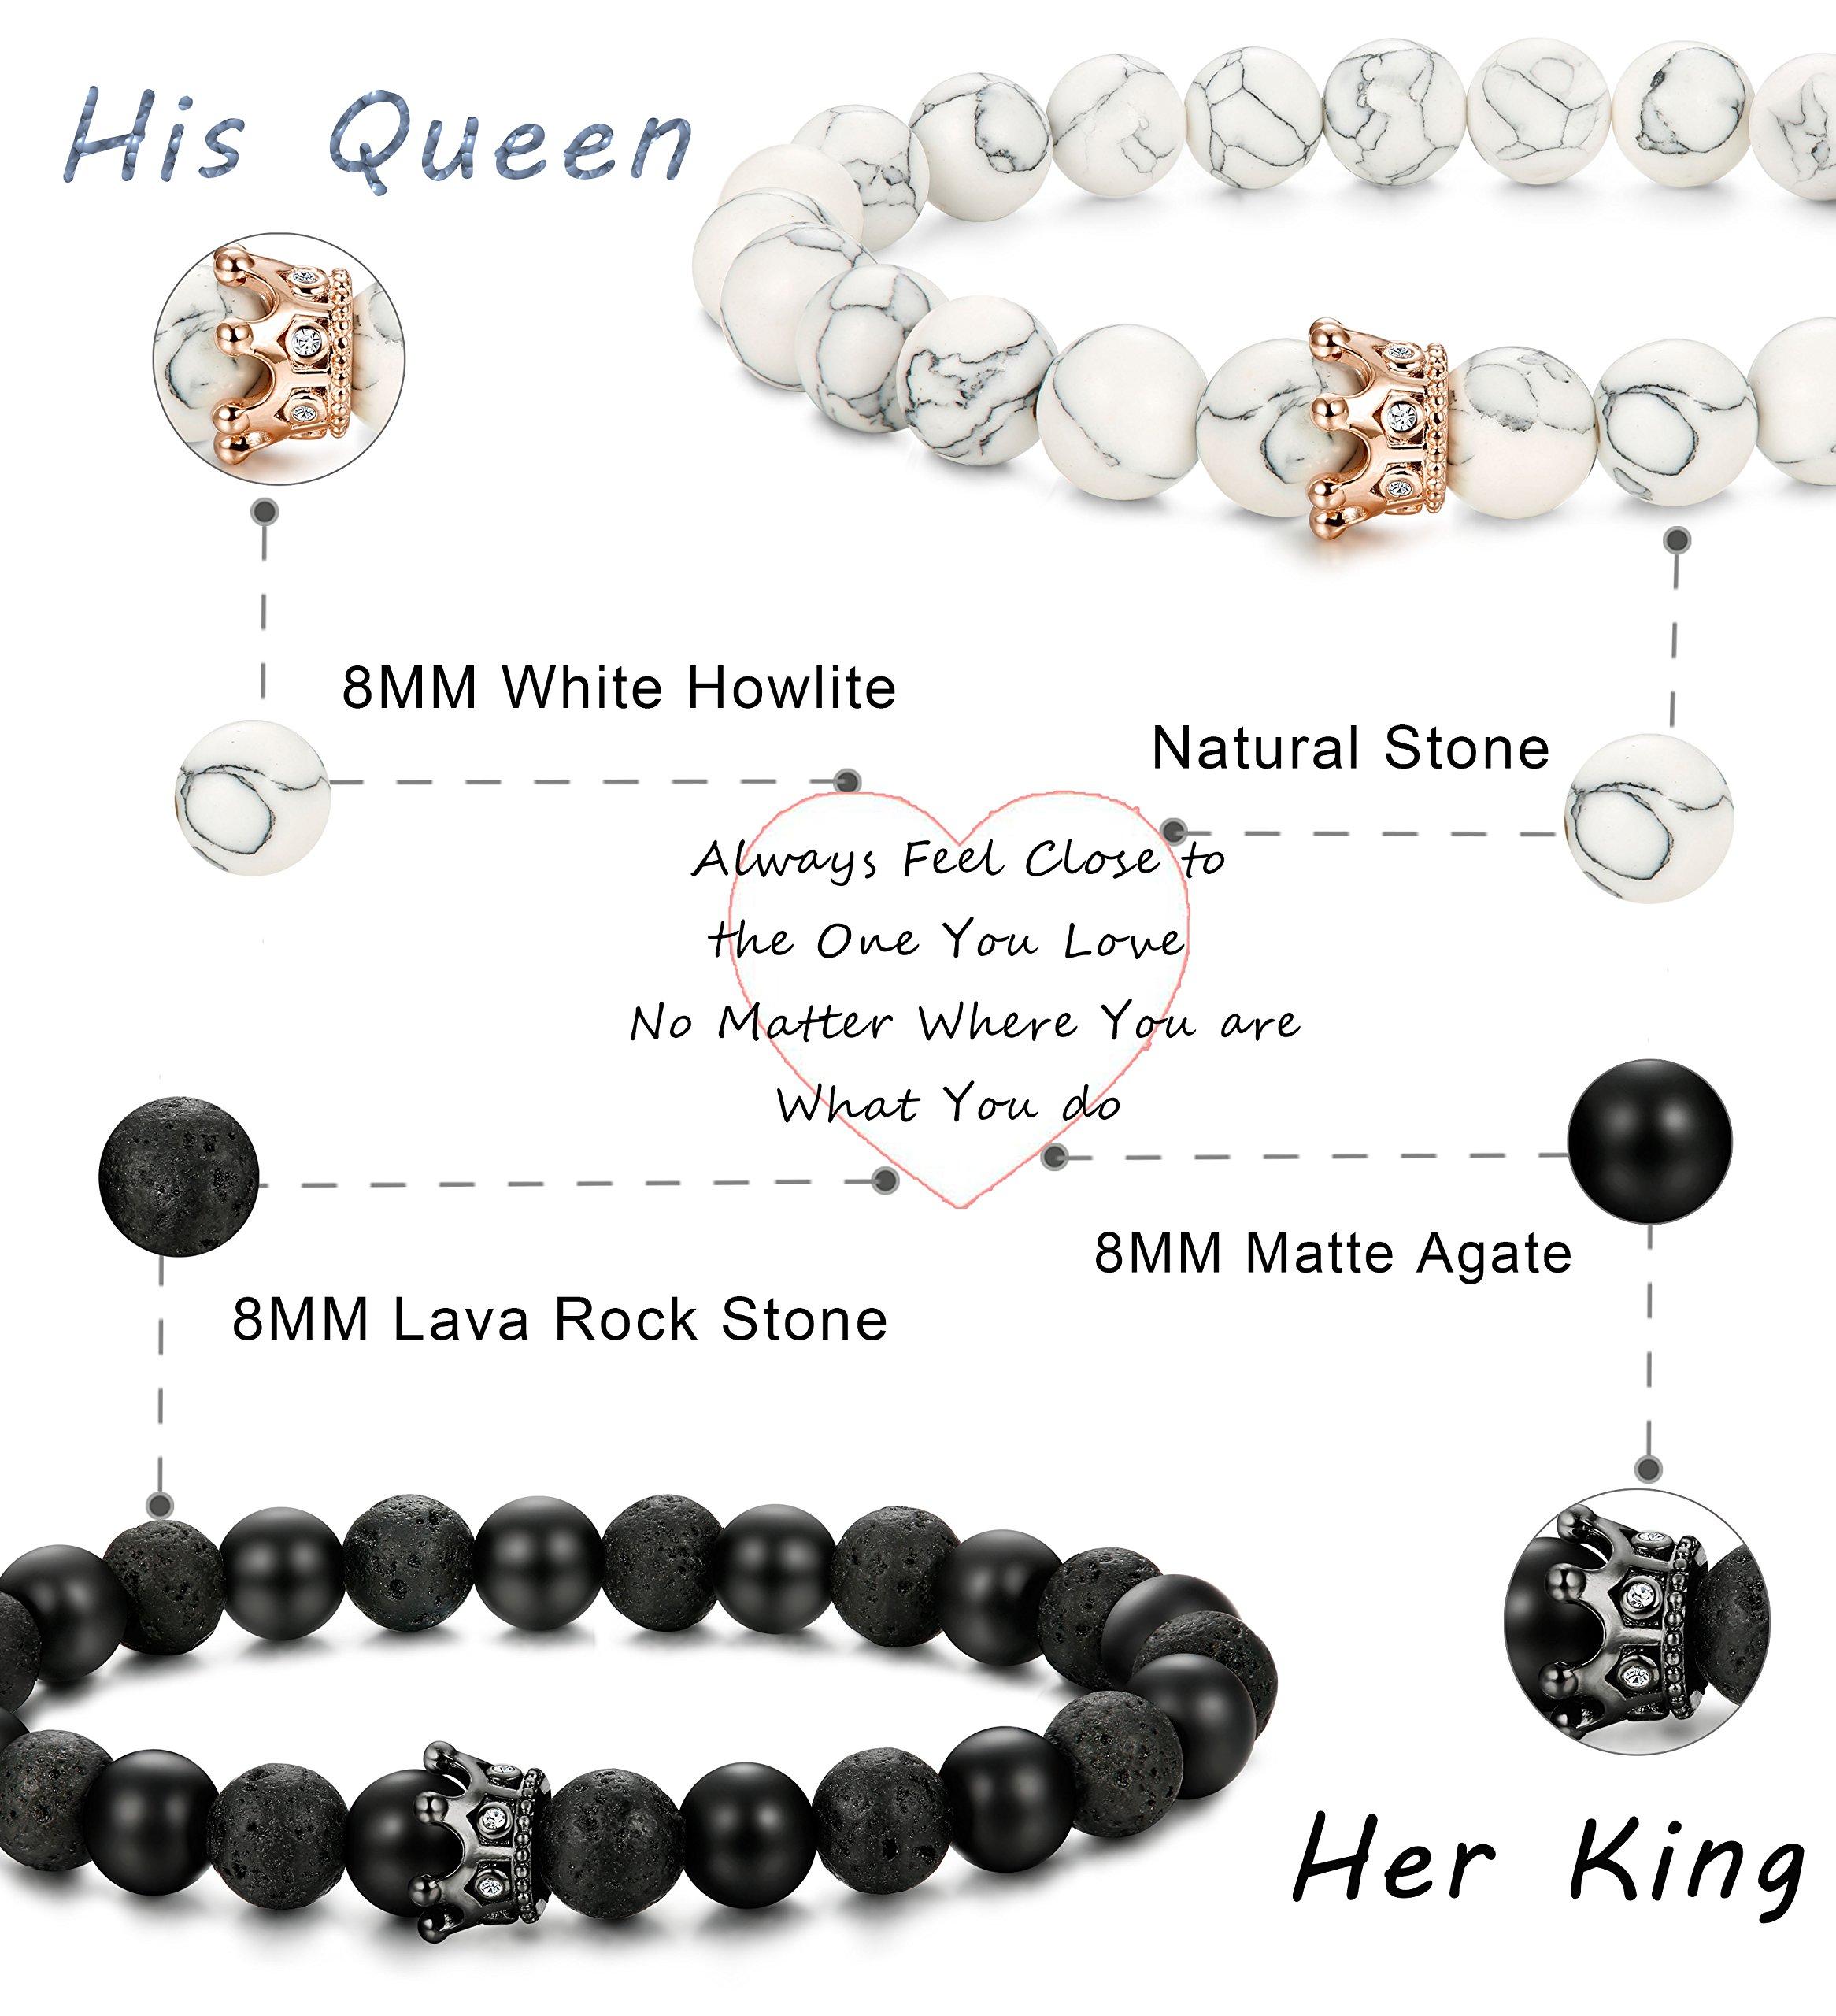 FIBO STEEL 4 Pcs Couples Bracelet for Men Women His & Her Crown Queen Bracelets Set 8mm Beads Bracelets by FIBO STEEL (Image #2)